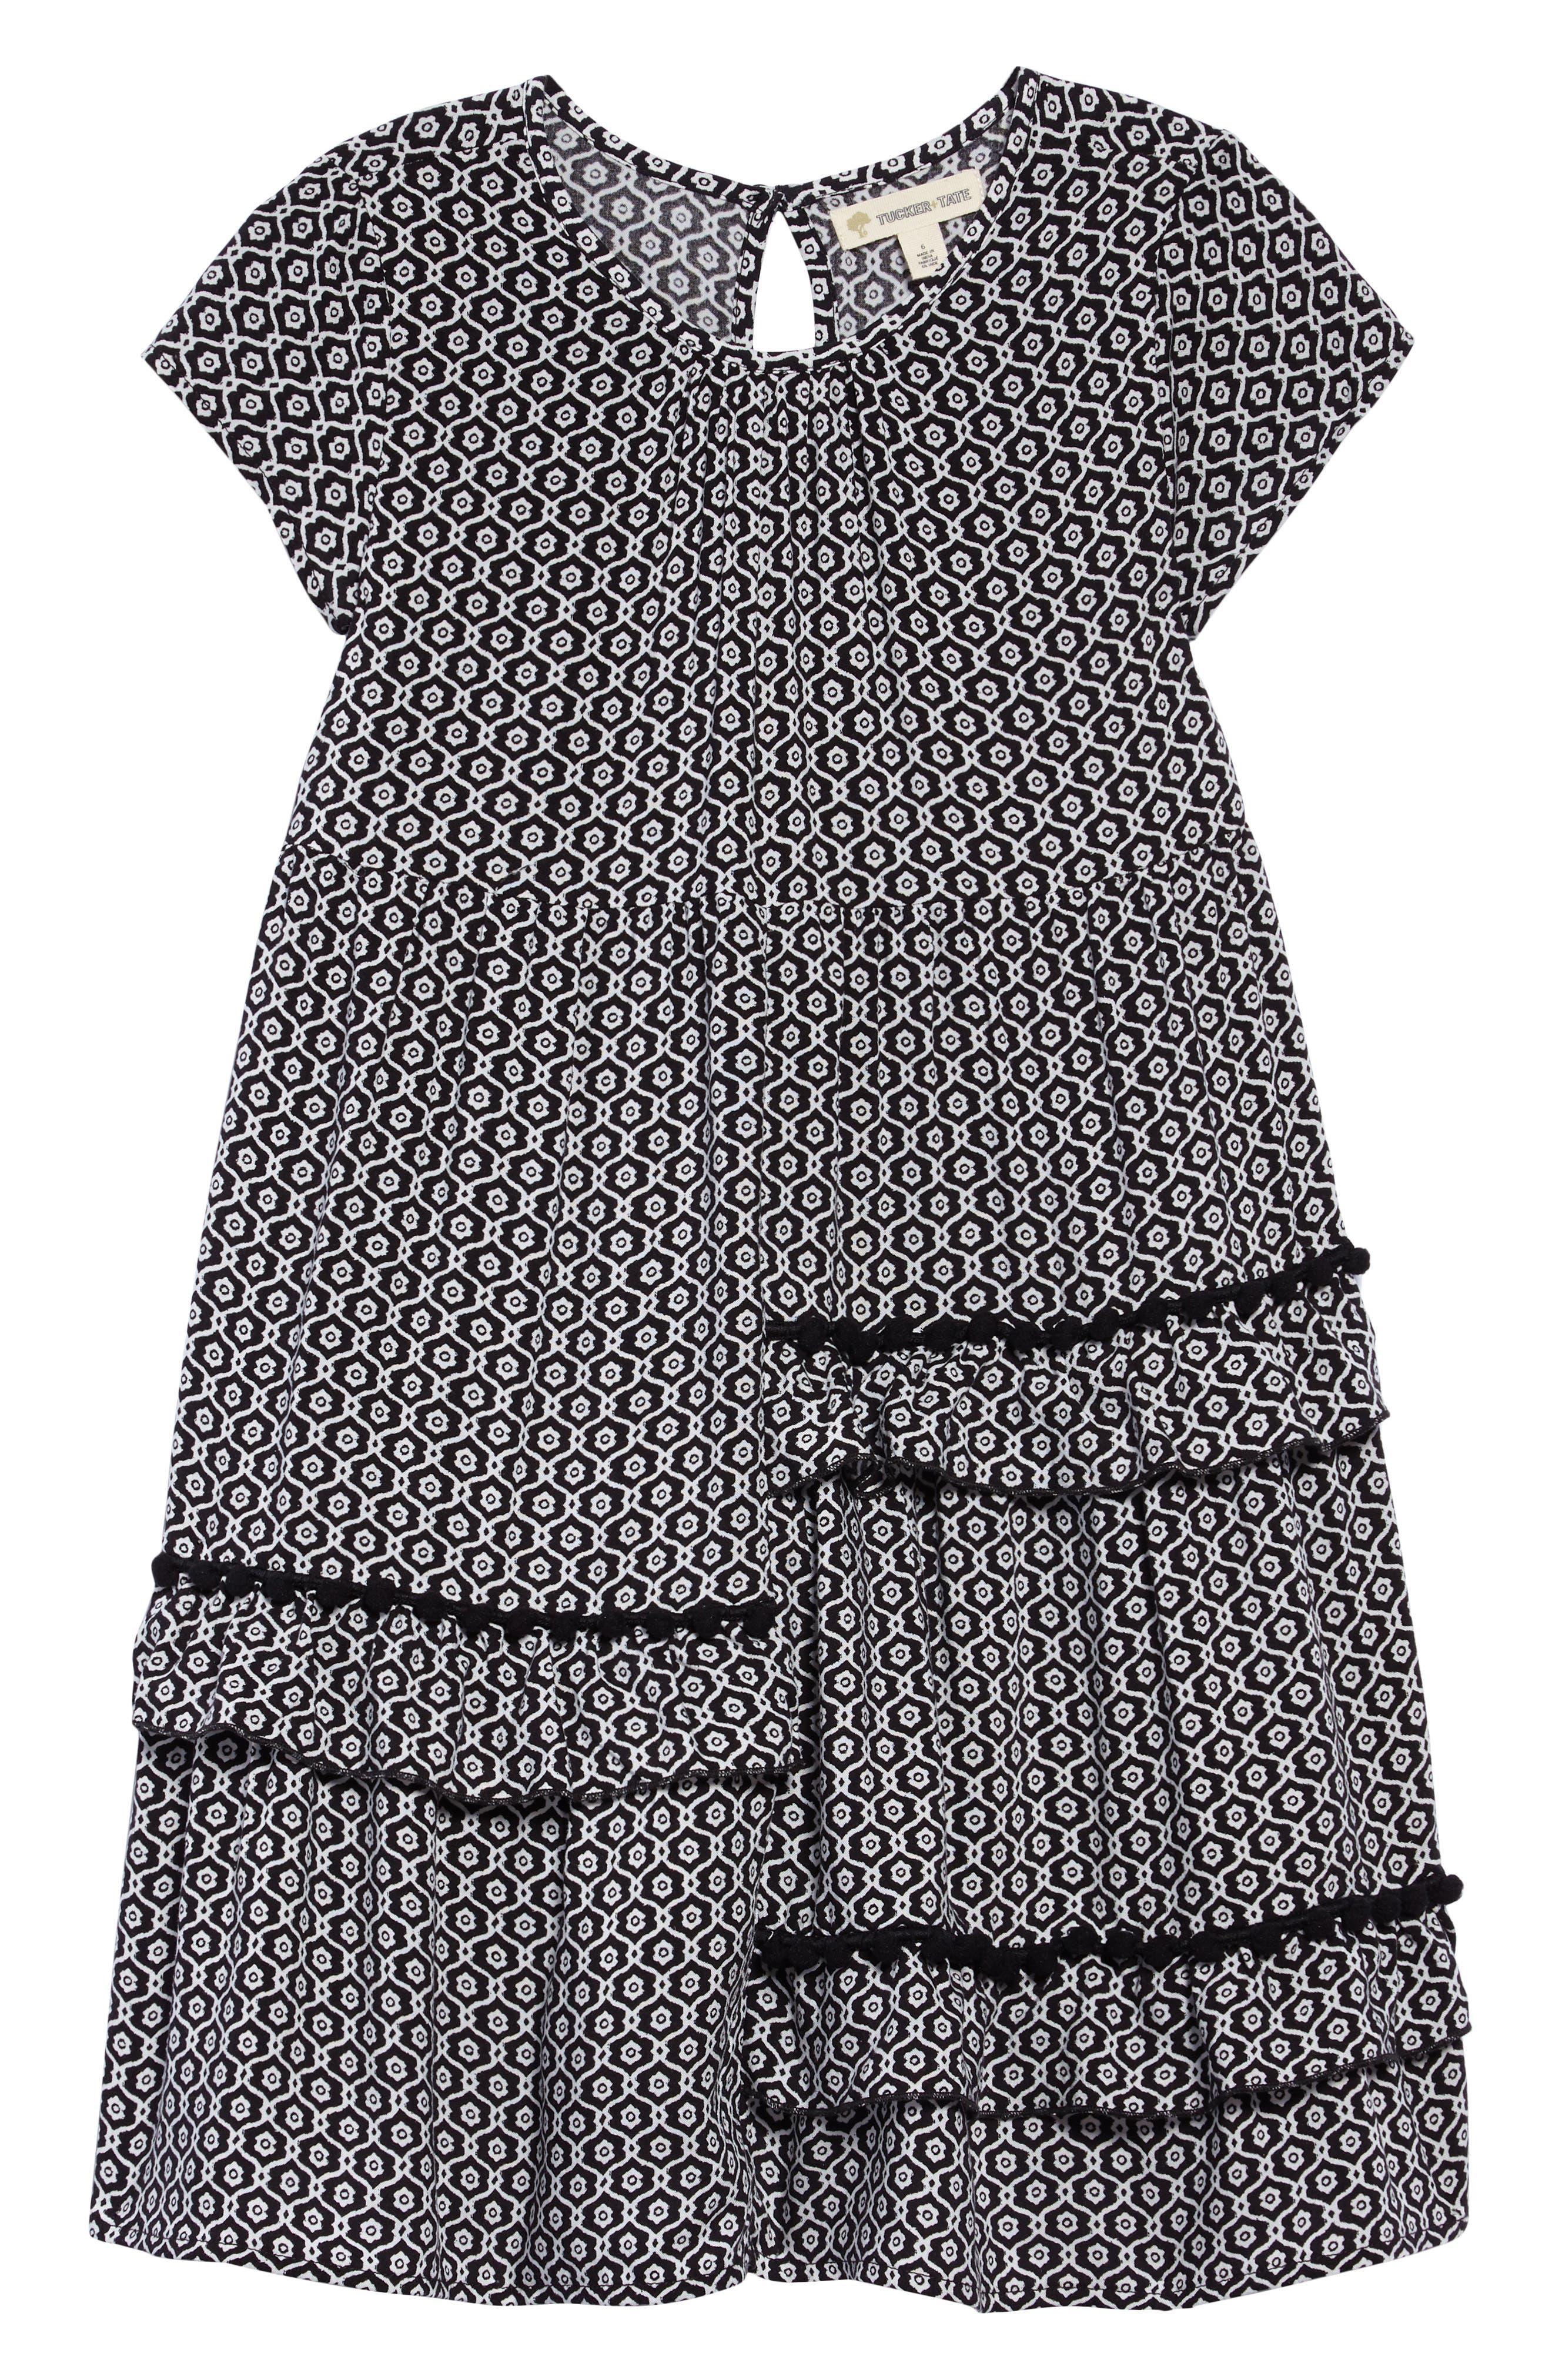 Print Dress,                             Main thumbnail 1, color,                             001